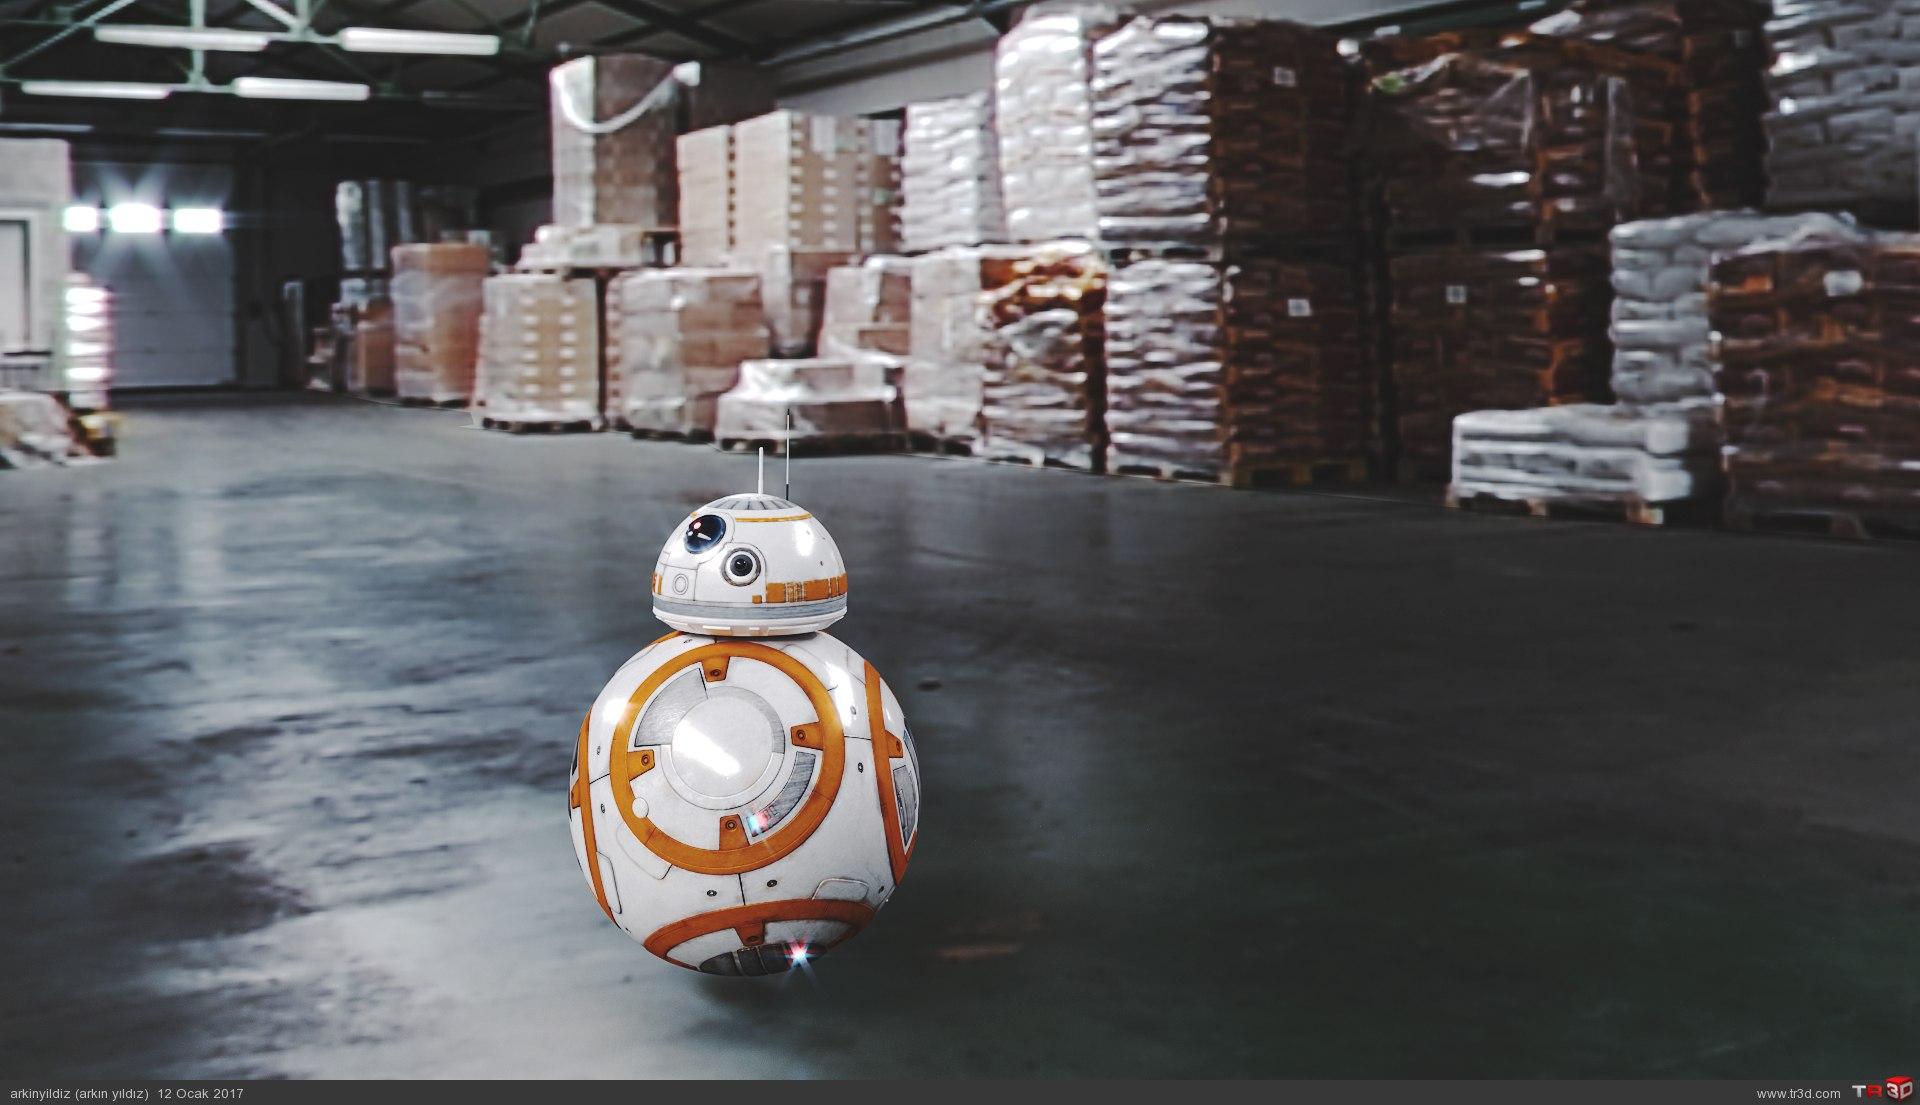 Droid Güvenlik 1